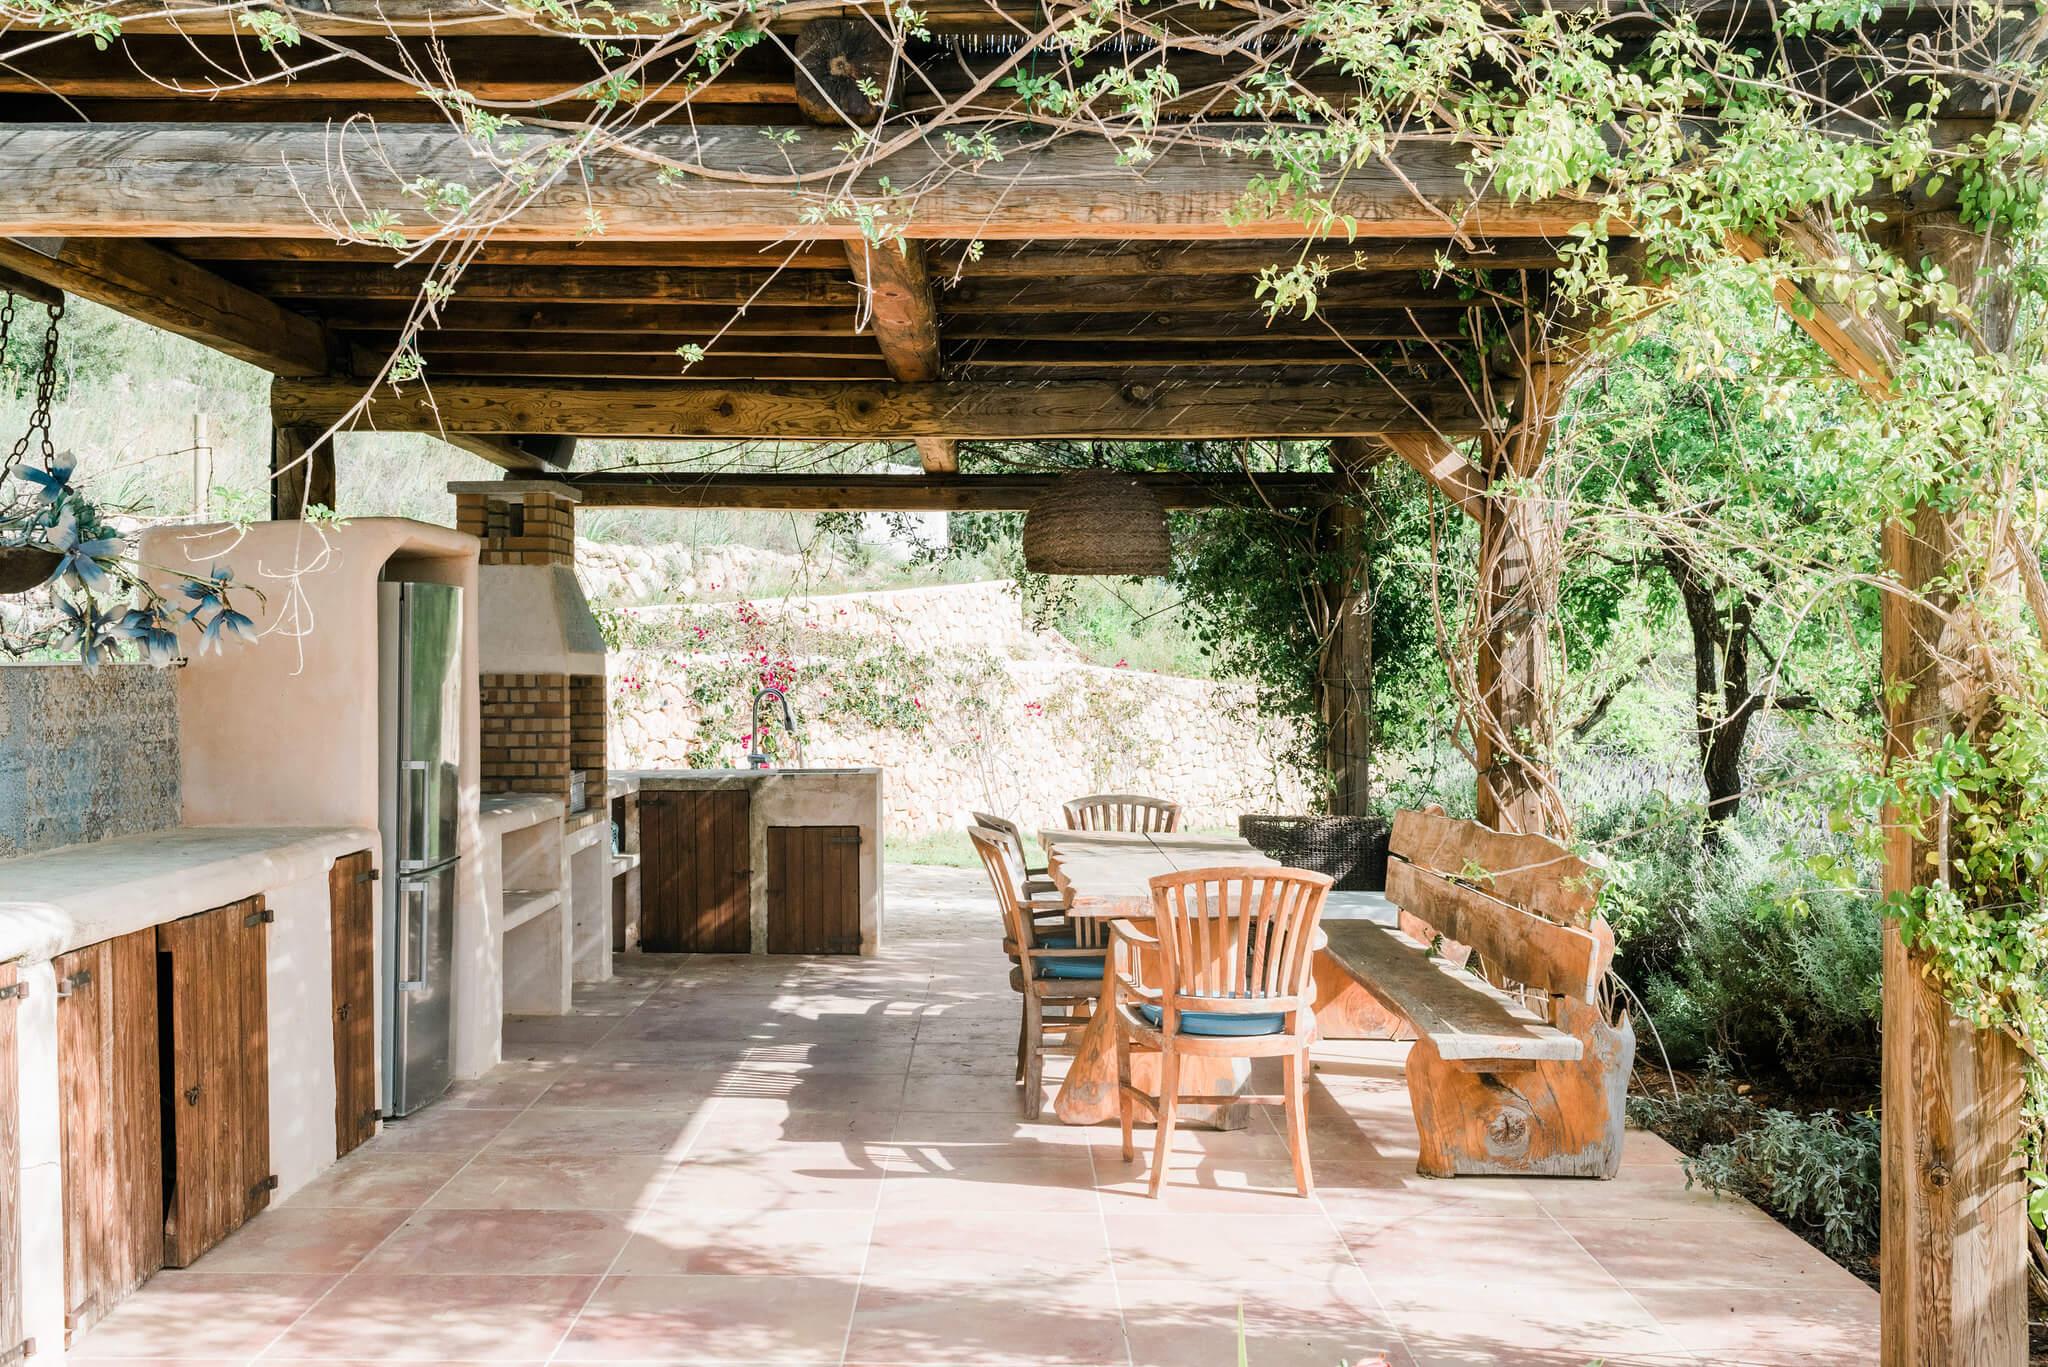 https://www.white-ibiza.com/wp-content/uploads/2020/06/white-ibiza-villas-los-corrales-exterior-outside-kitchen2.jpg